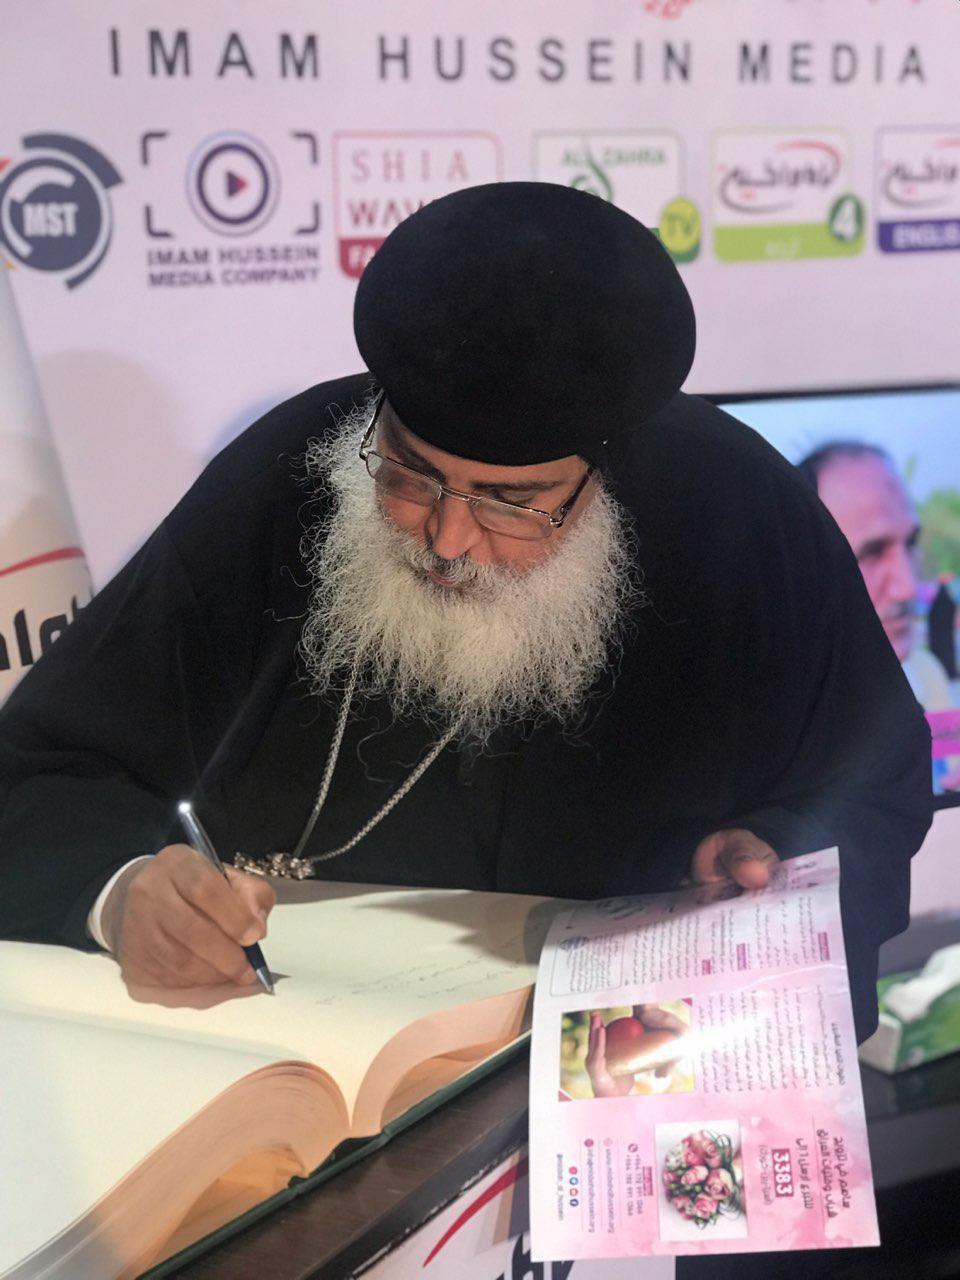 Photo of President of the Coptic community visits Imam Hussein Media Group's pavilion